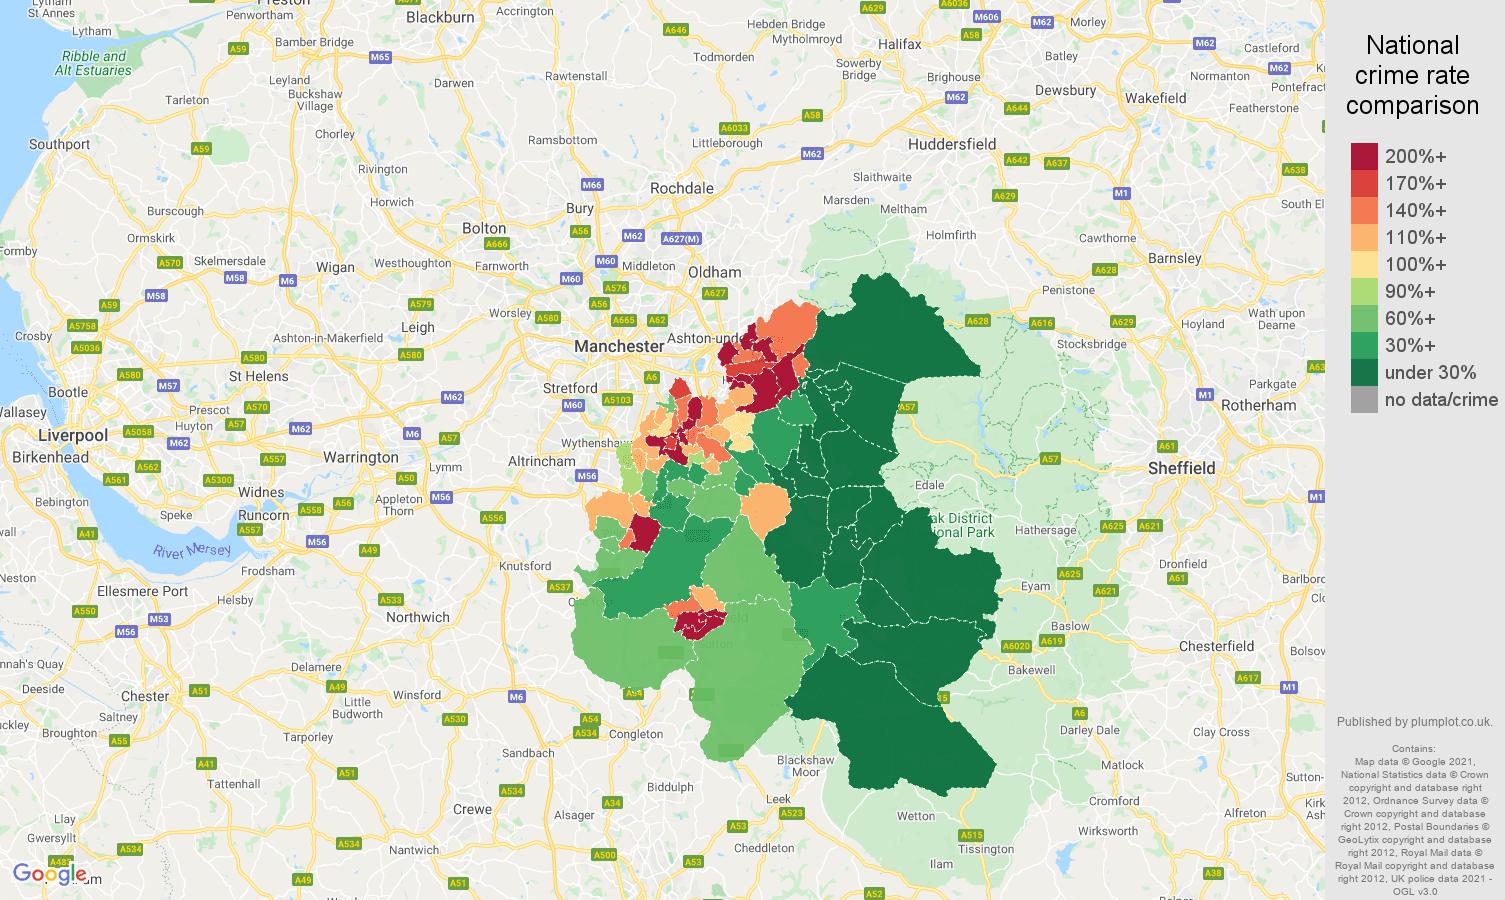 Stockport public order crime rate comparison map